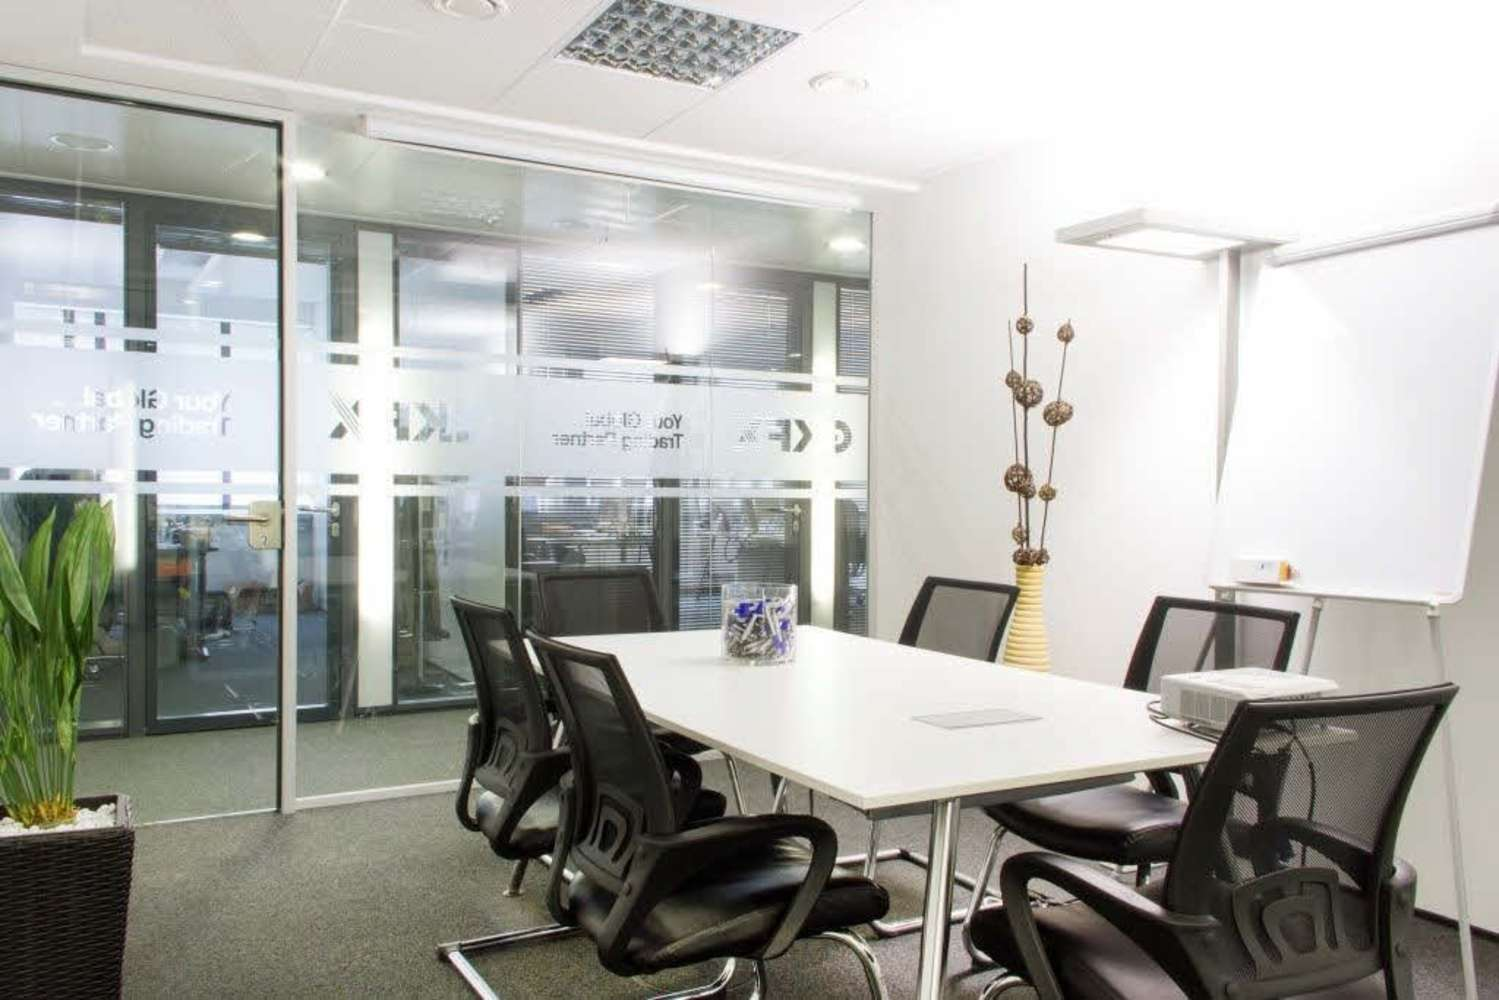 Büros Frankfurt am main, 60329 - Büro - Frankfurt am Main, Bahnhofsviertel - F0121 - 9414580